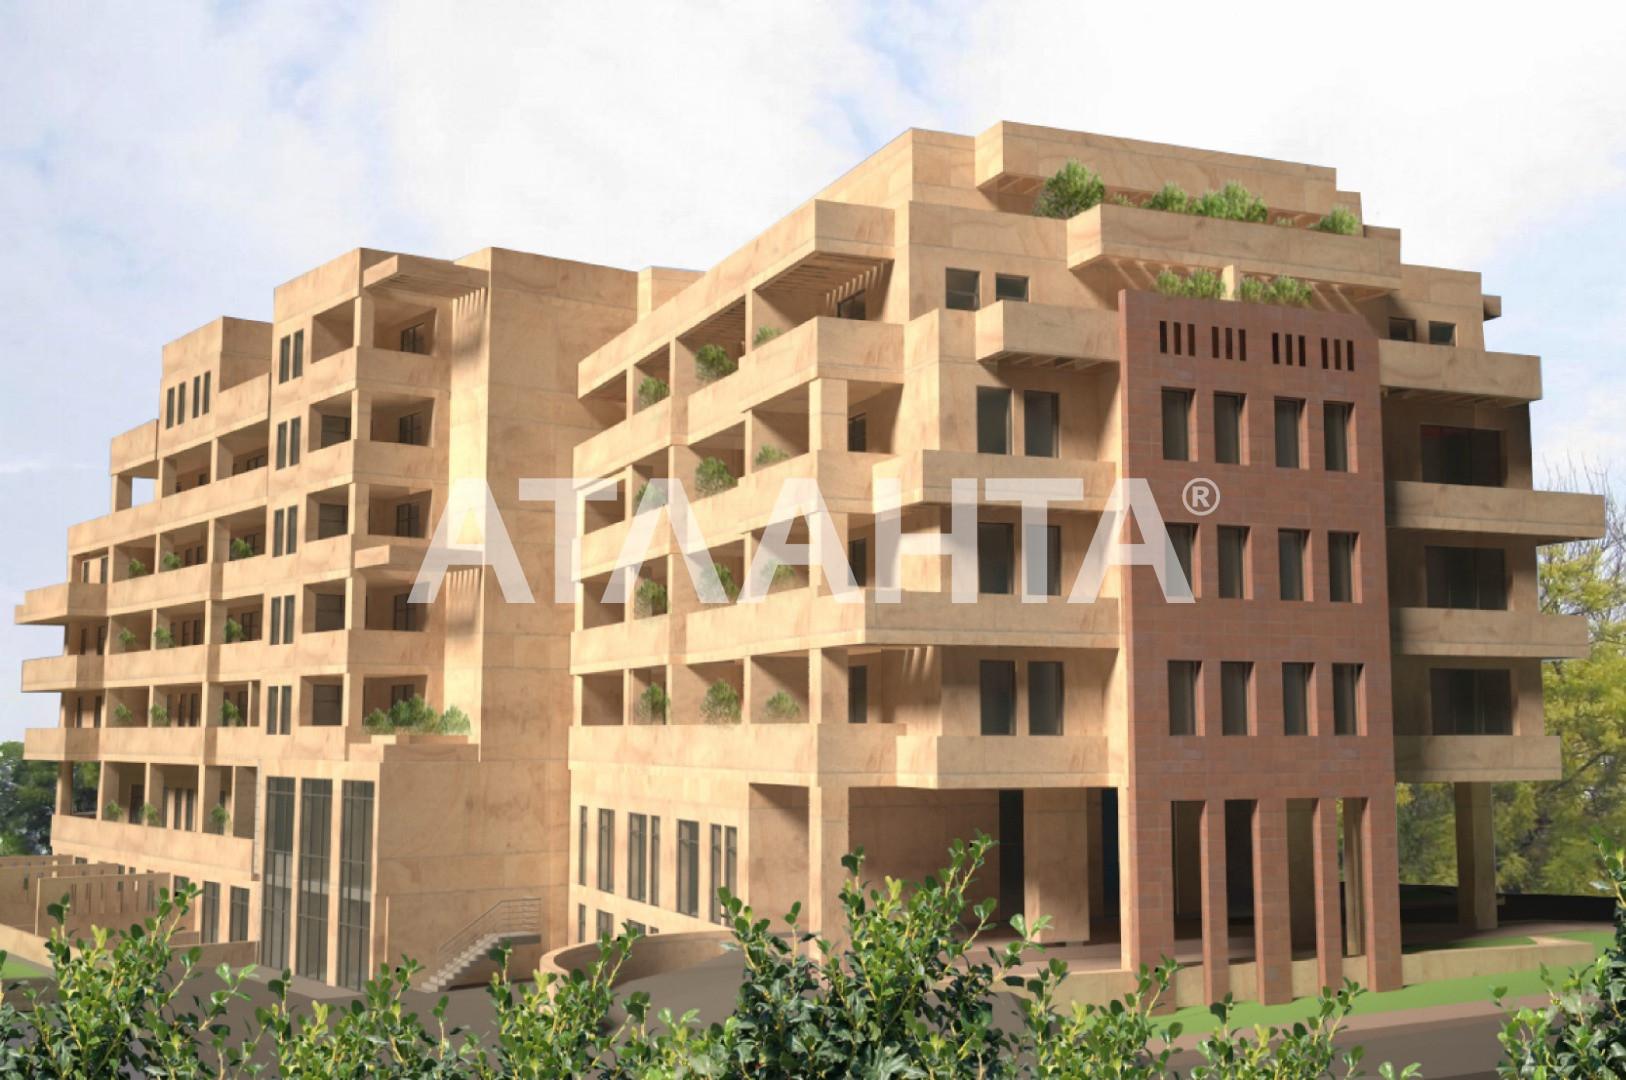 Продается 1-комнатная Квартира на ул. Каманина — 58 300 у.е.